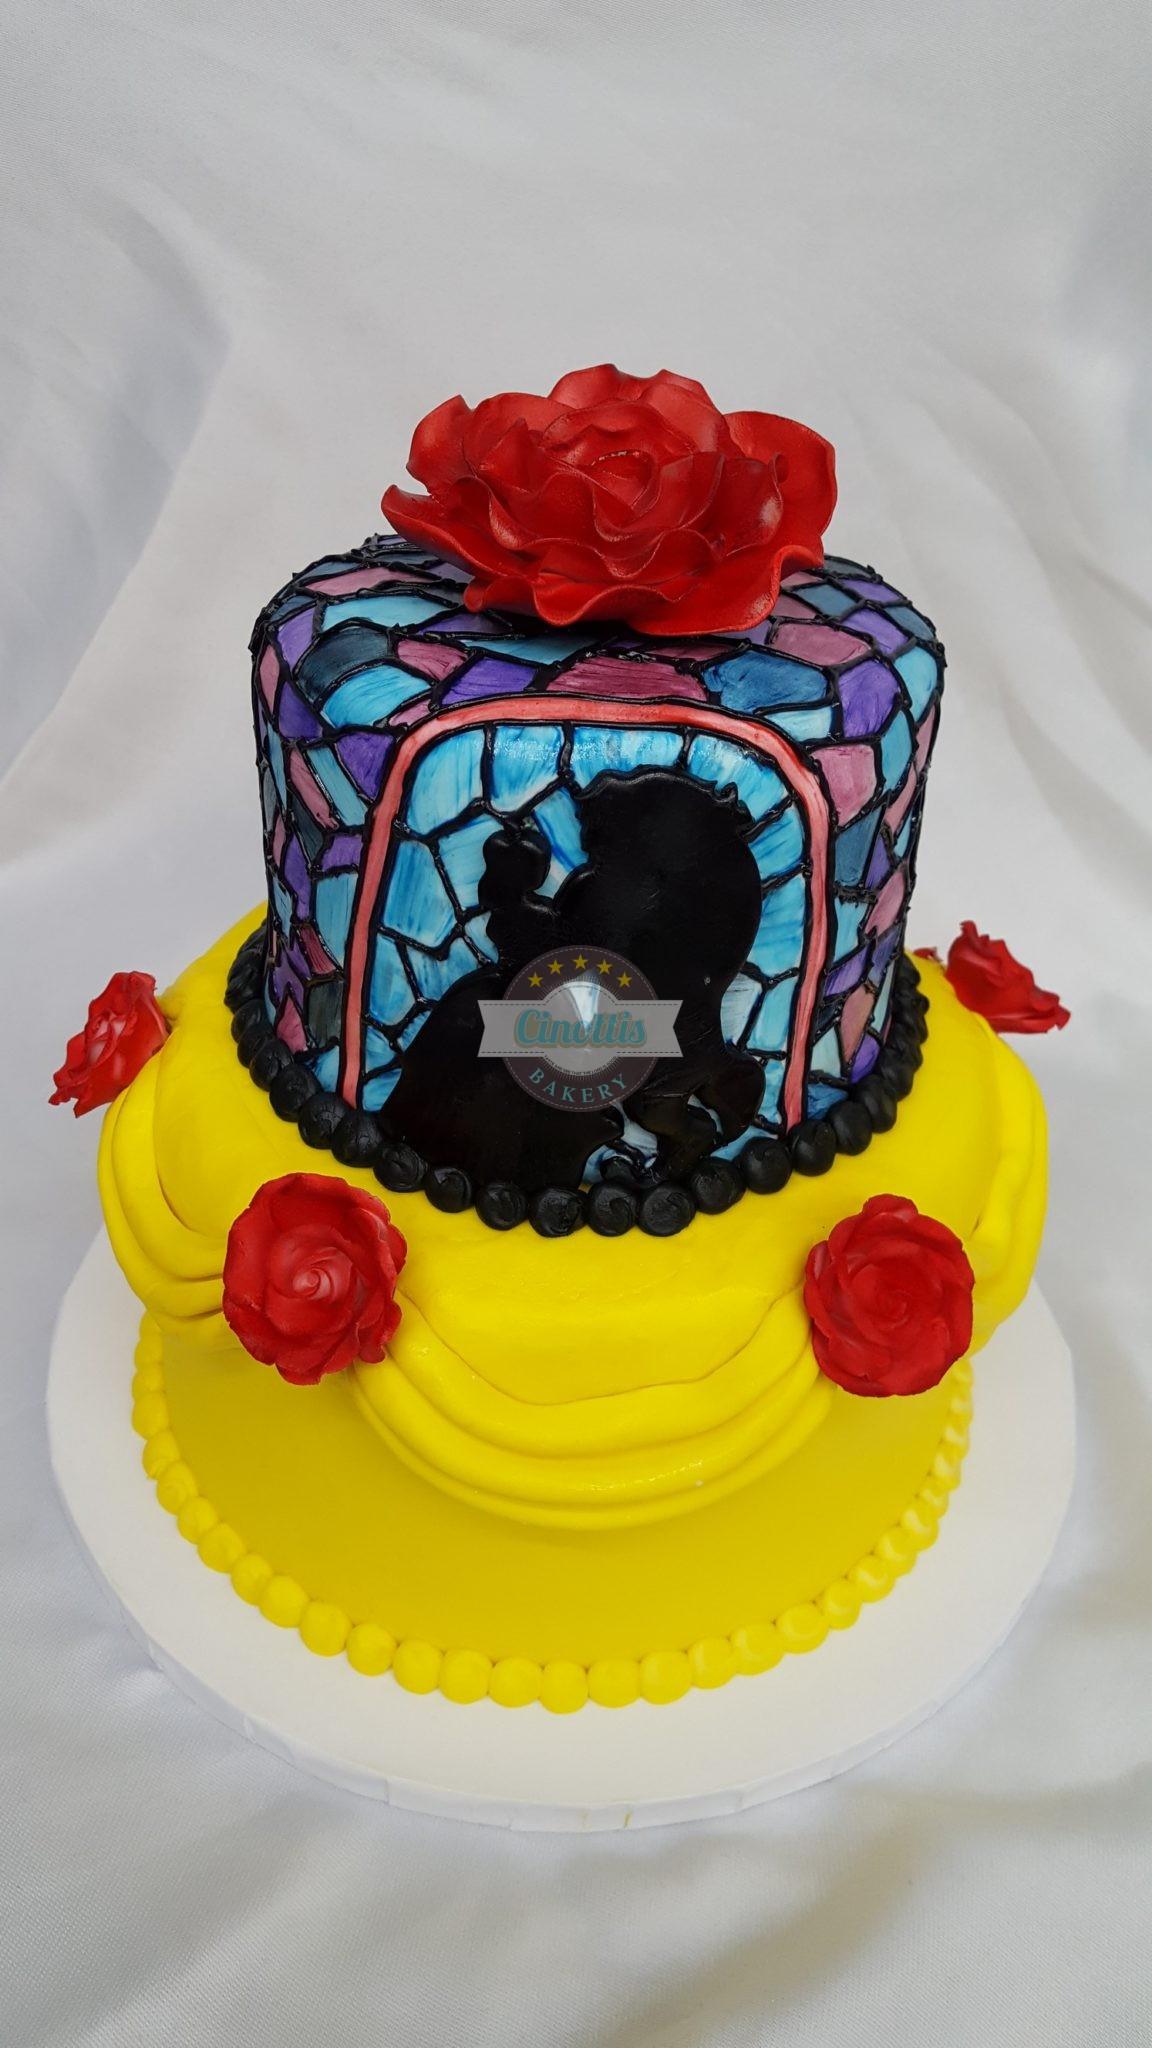 Landmark Birthday Cakes